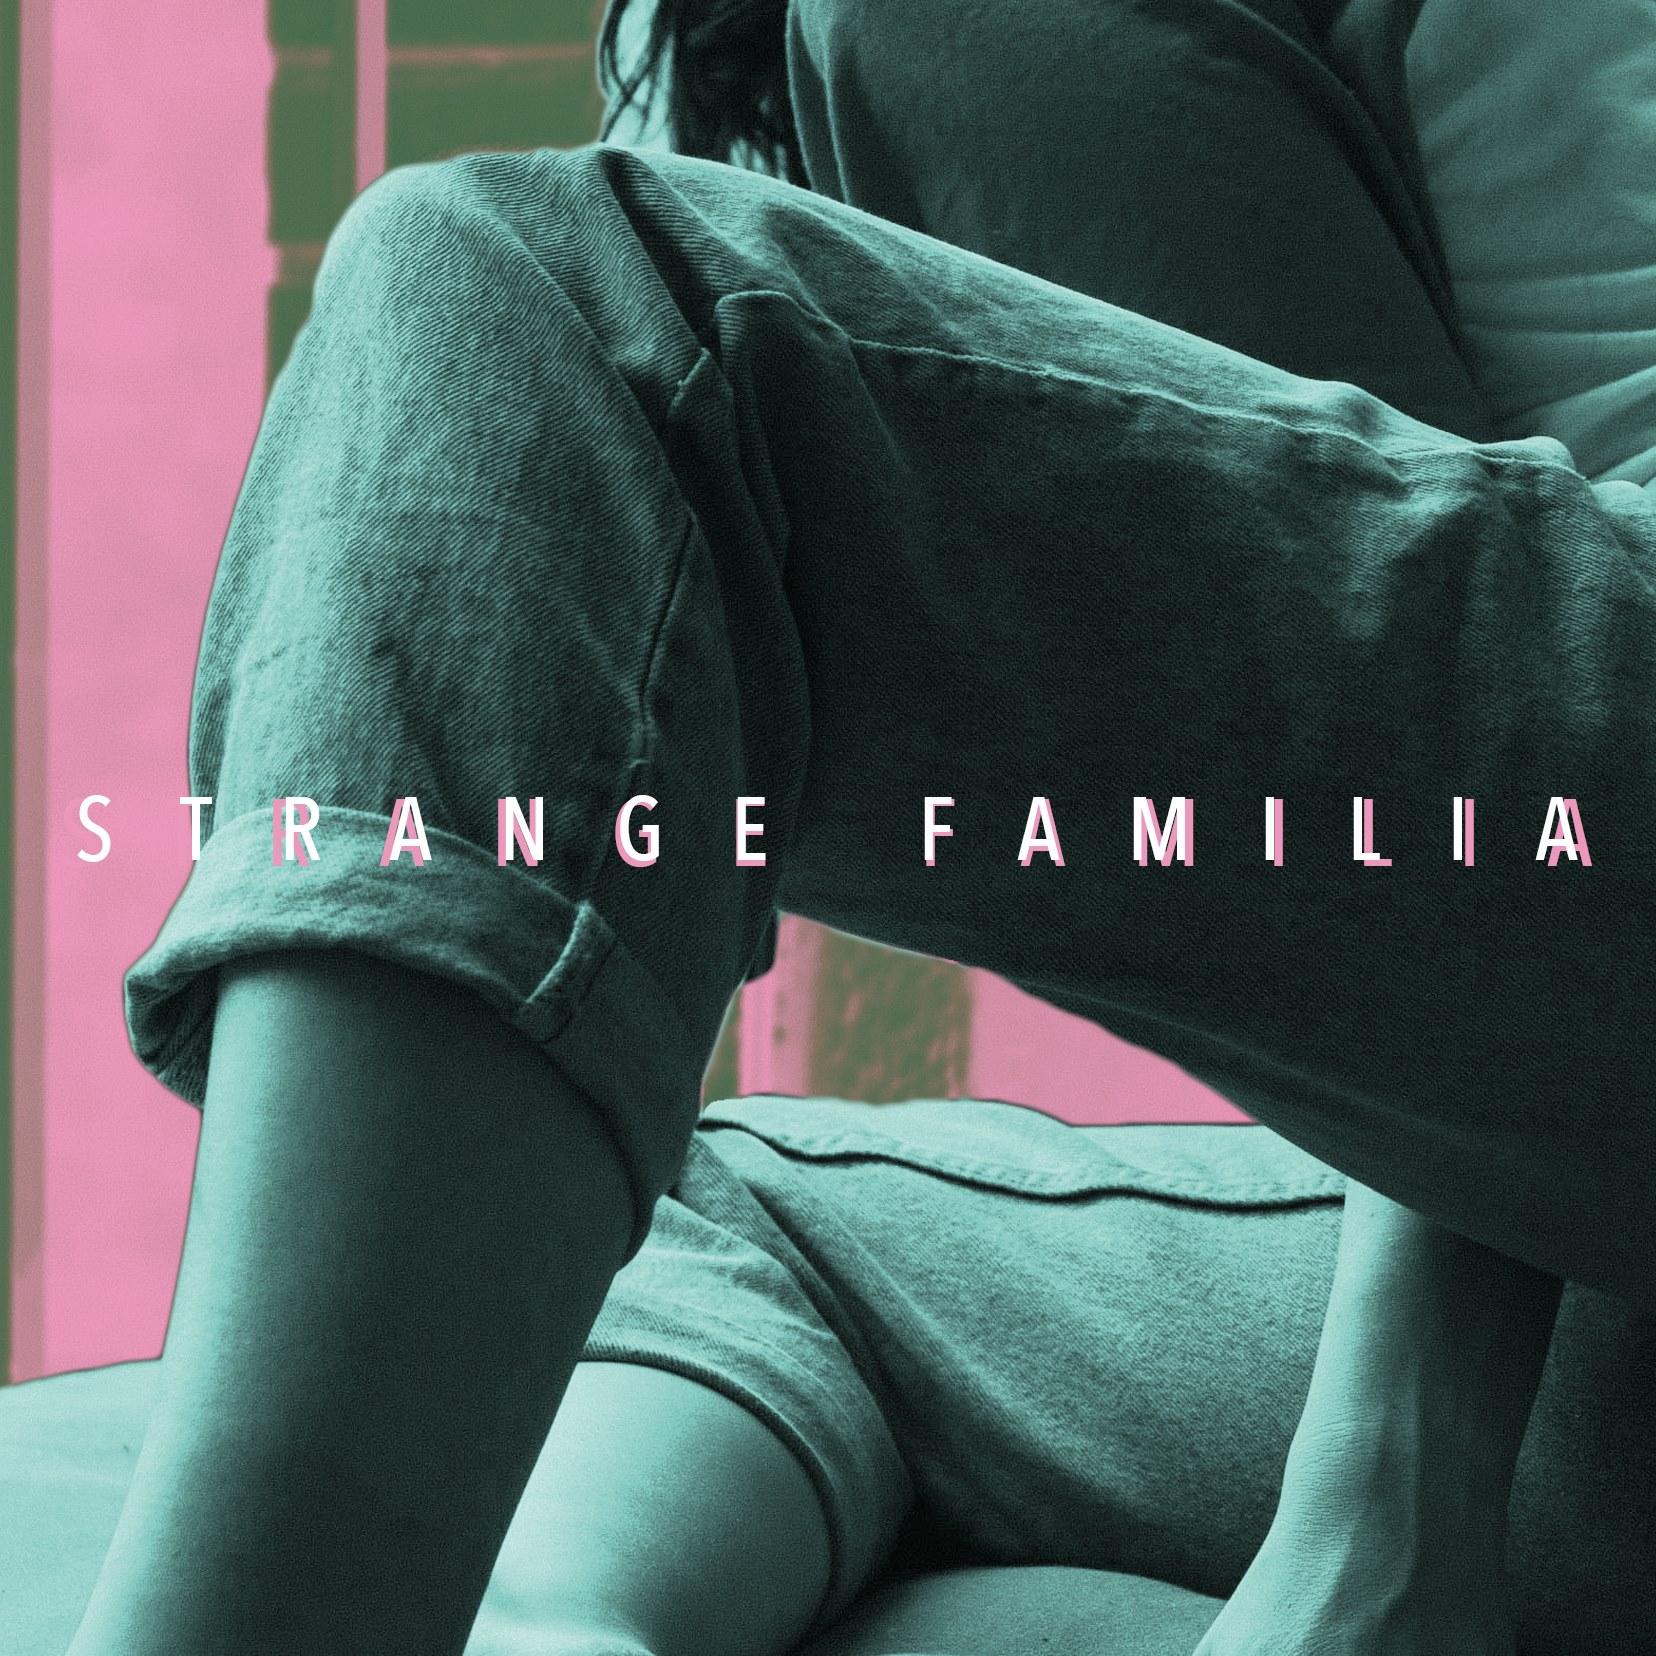 Love/Drugs by Strange Familia